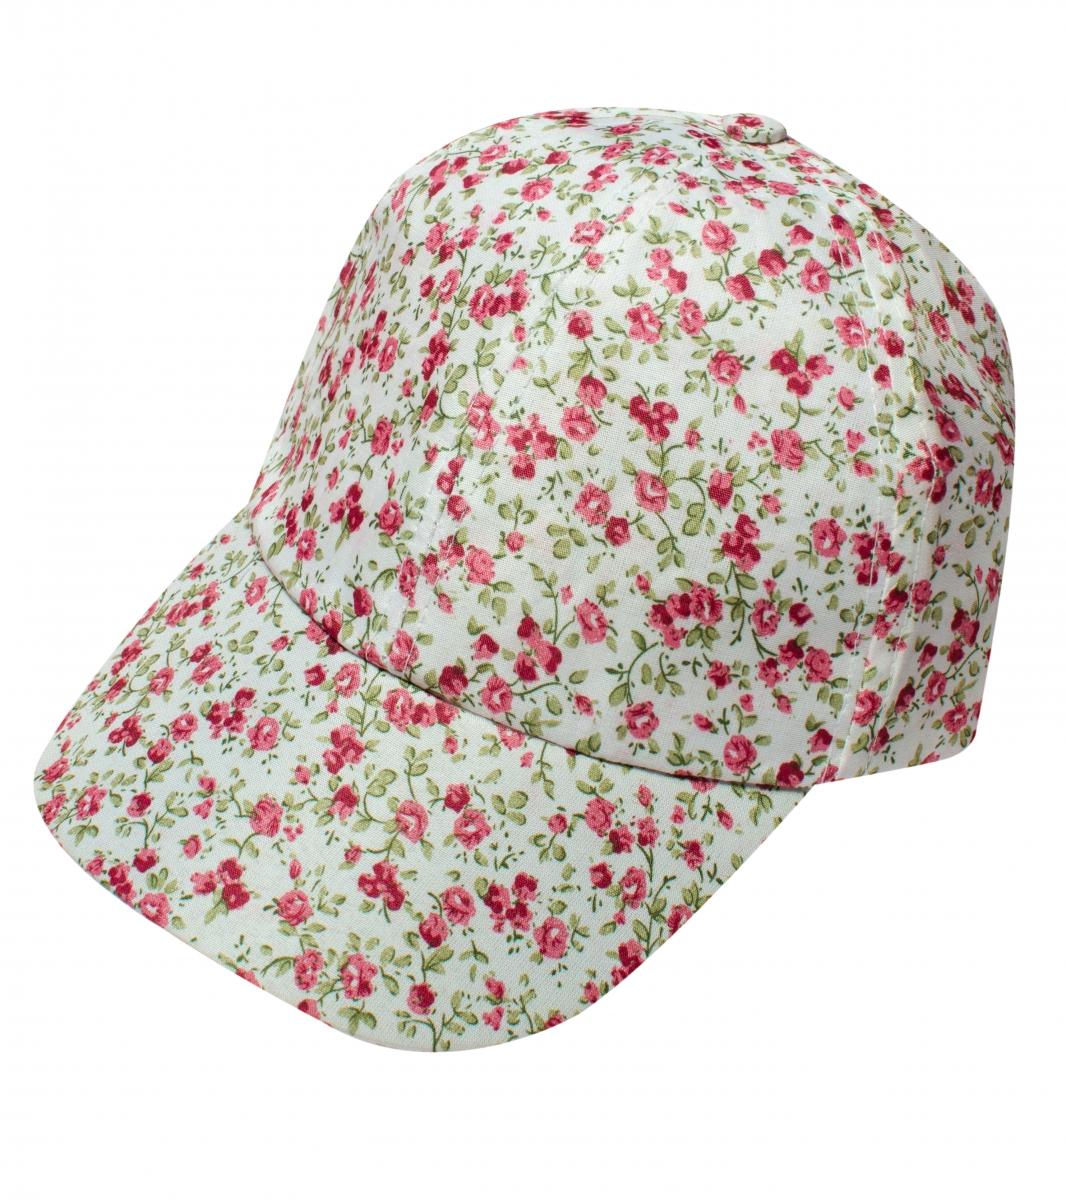 Sapca fete 2561 alb flori roz 44-52